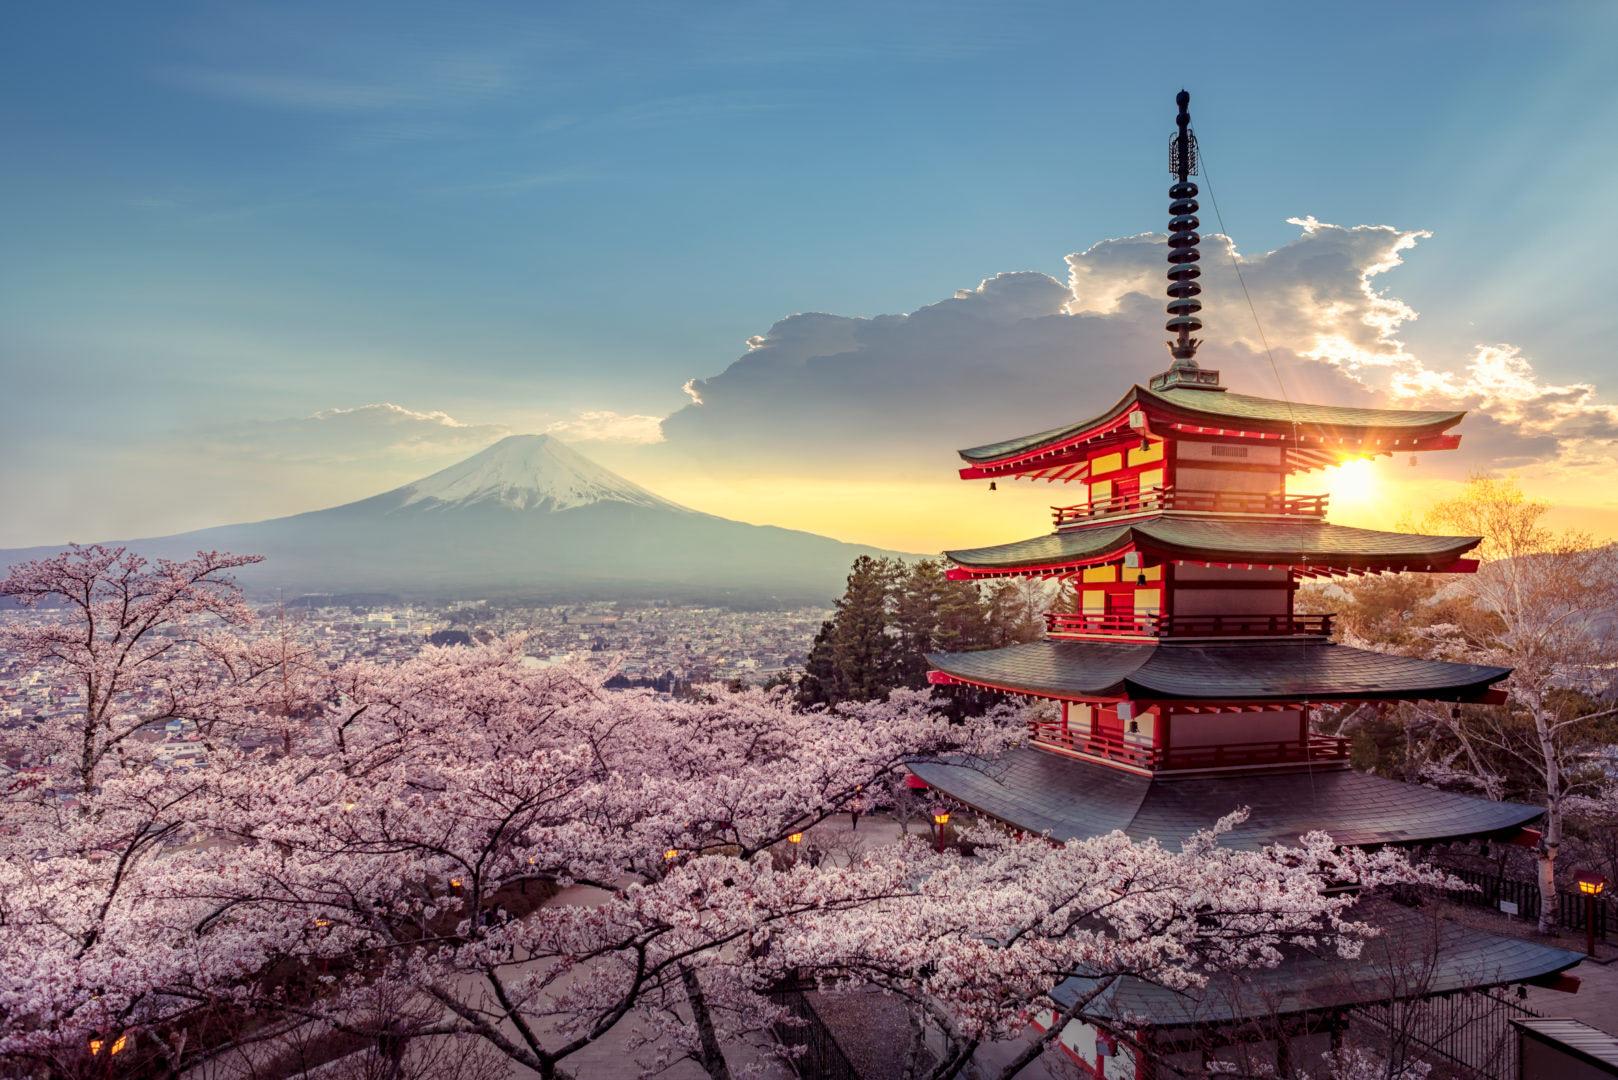 Sakura au printemps au Japon_AdobeStock